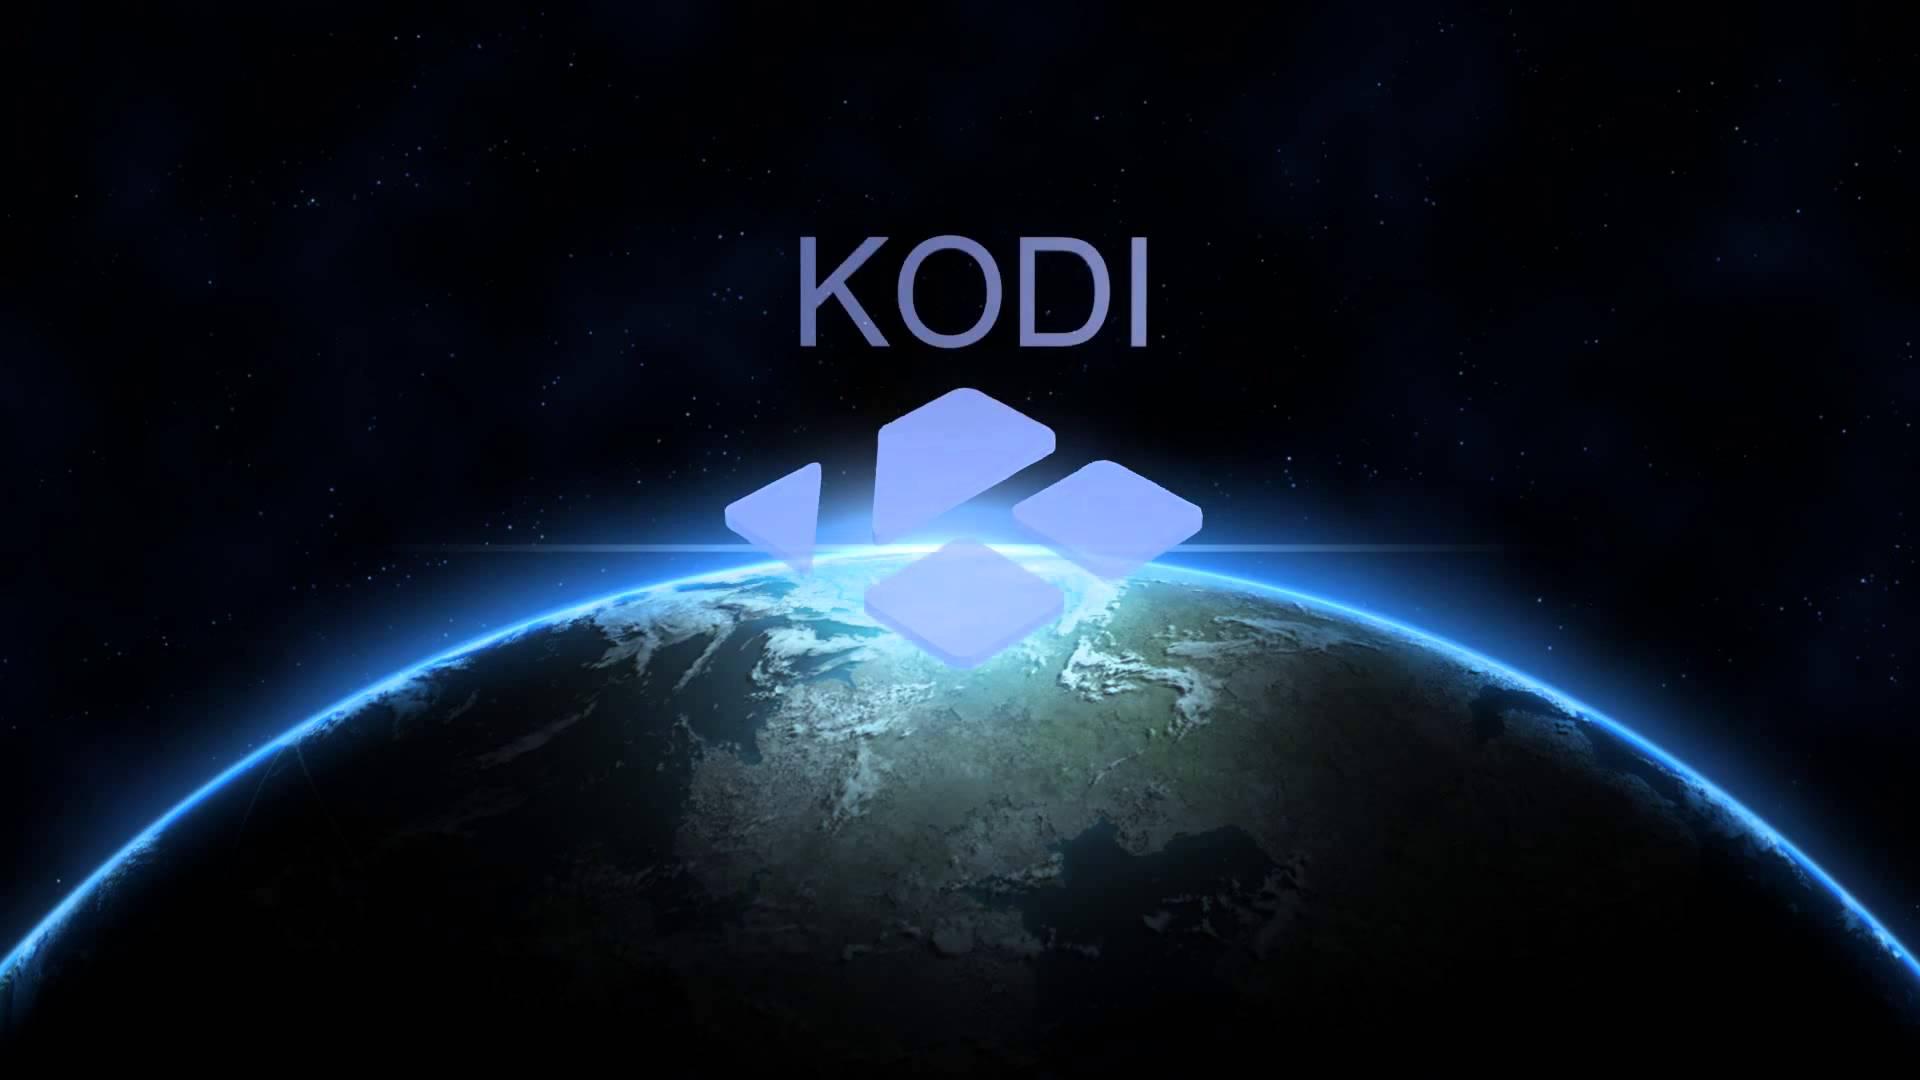 Wallpaper download kodi - Kodi Youtube